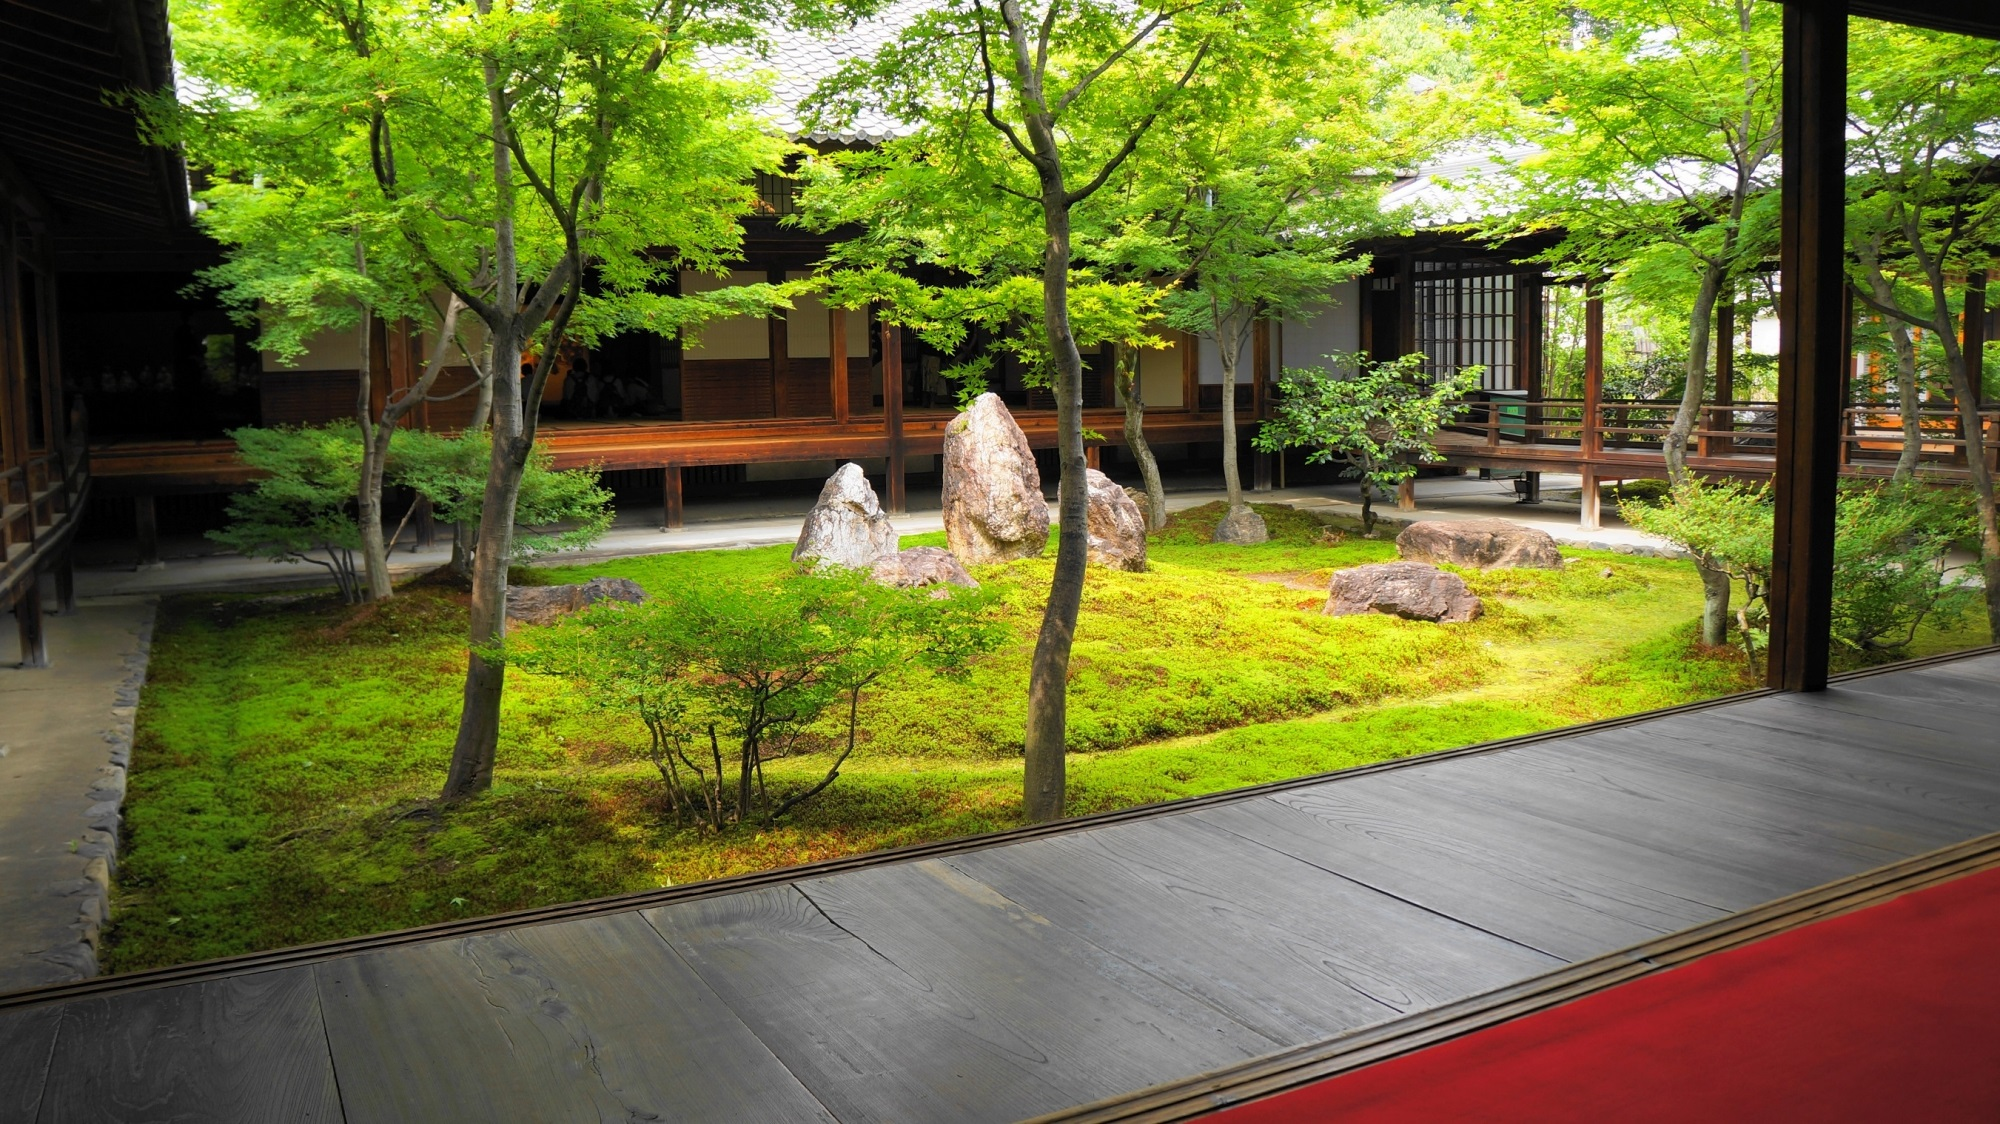 建仁寺 潮音庭 新緑と苔 絶品の中庭